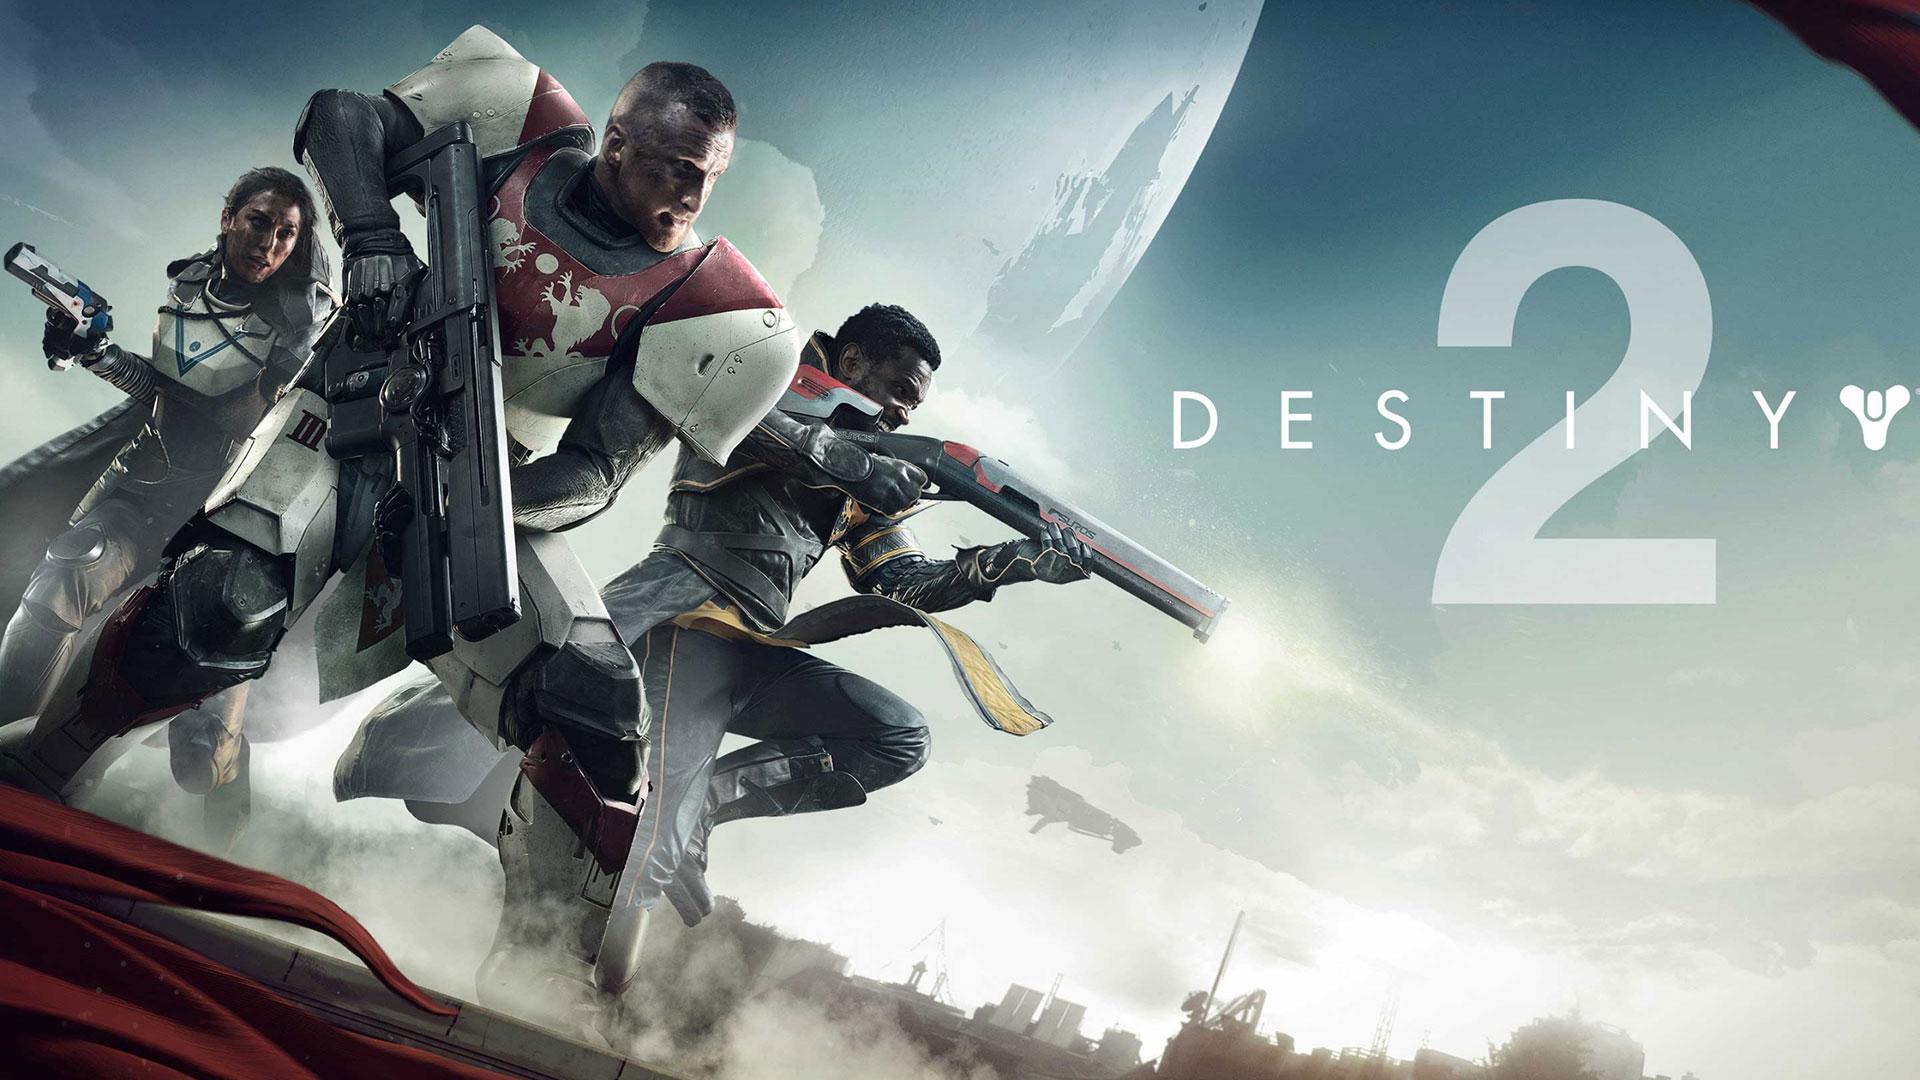 Destiny 2 za darmo. Jak odebrać?